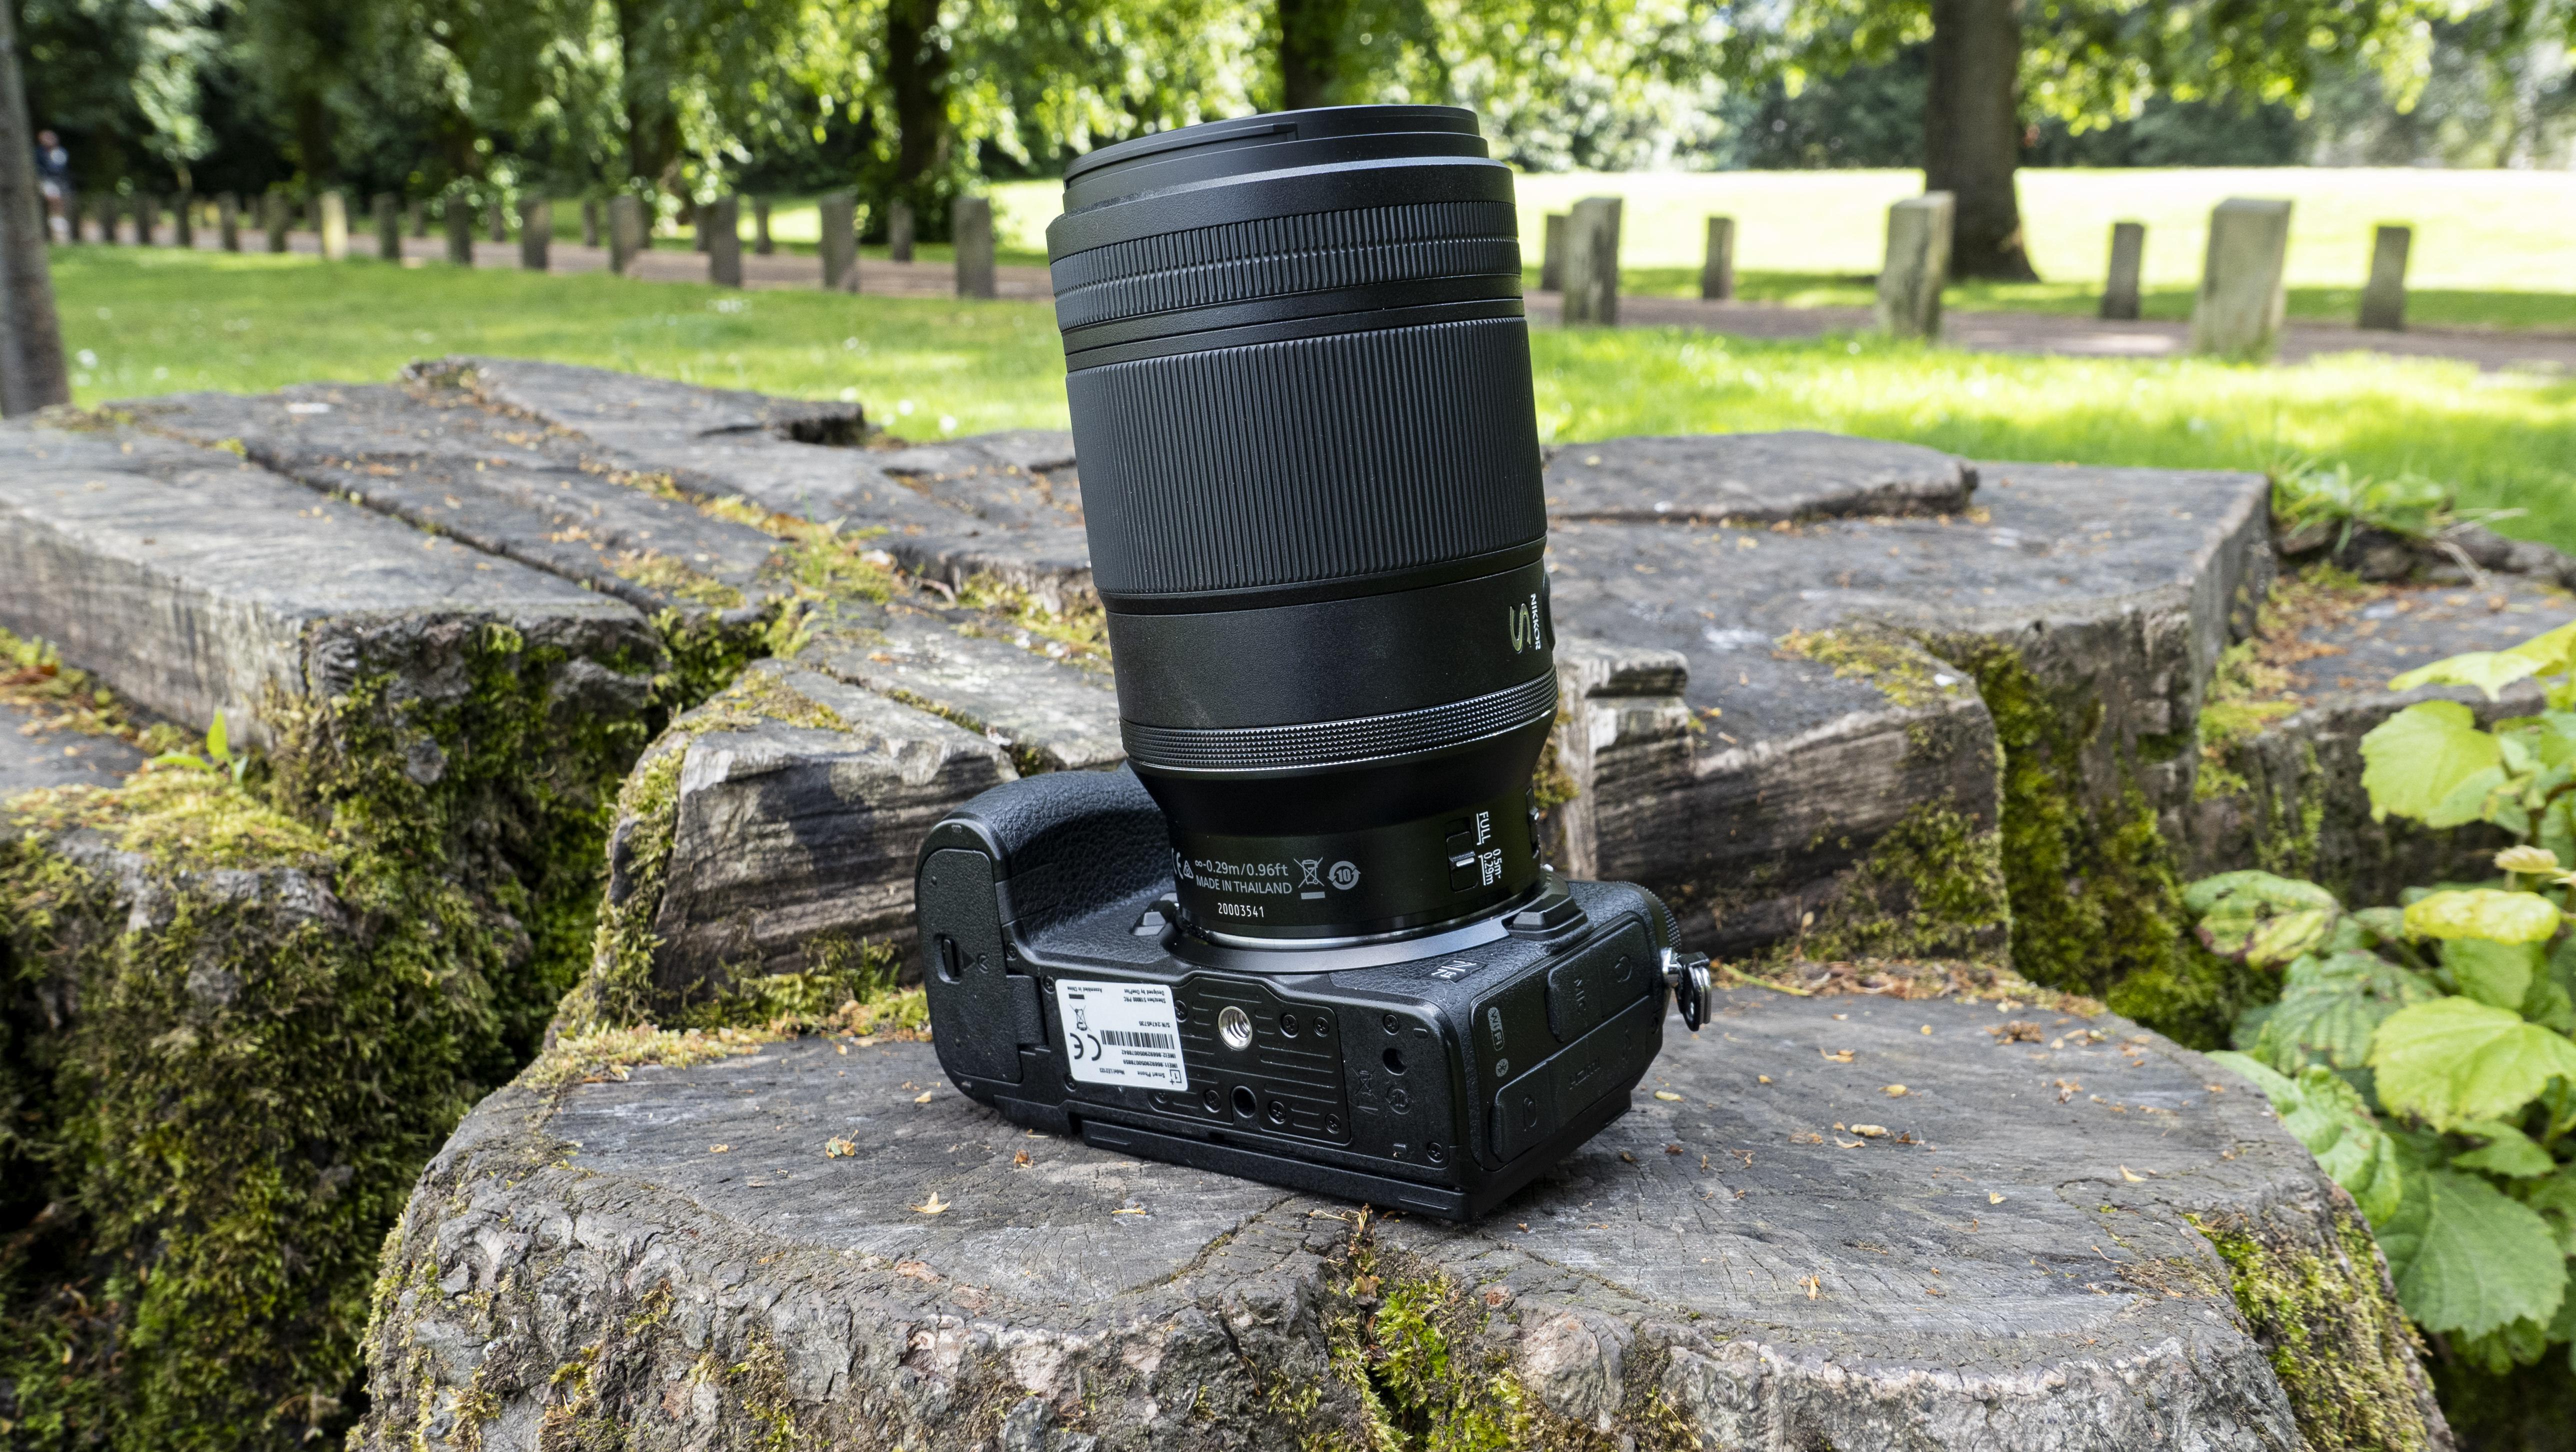 The underside of a Nikon Z7 II with the Nikon Nikkor Z MC 105mm f/2.8 VR S lens